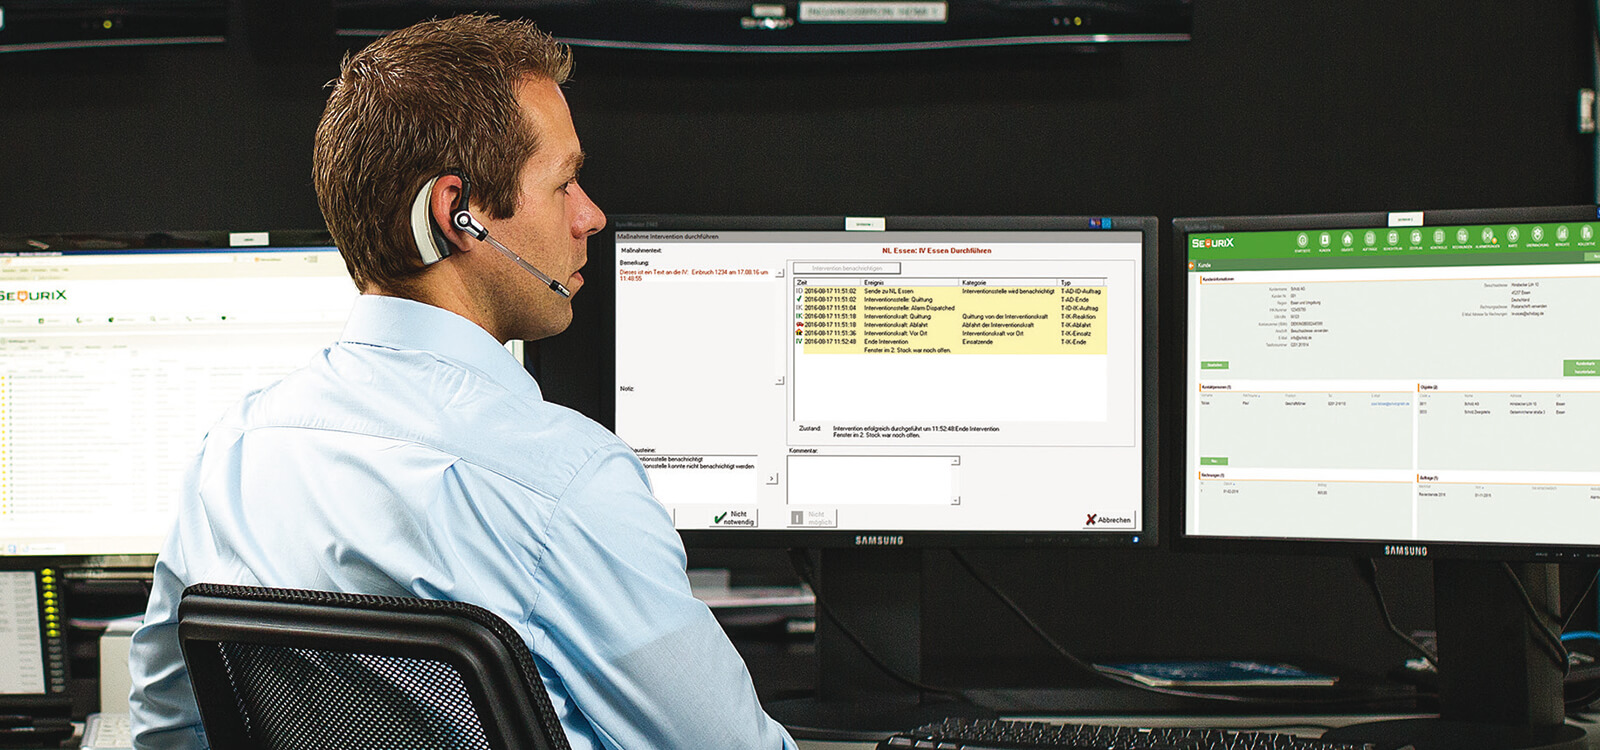 e-CLIPS koppeling alarmcentrales